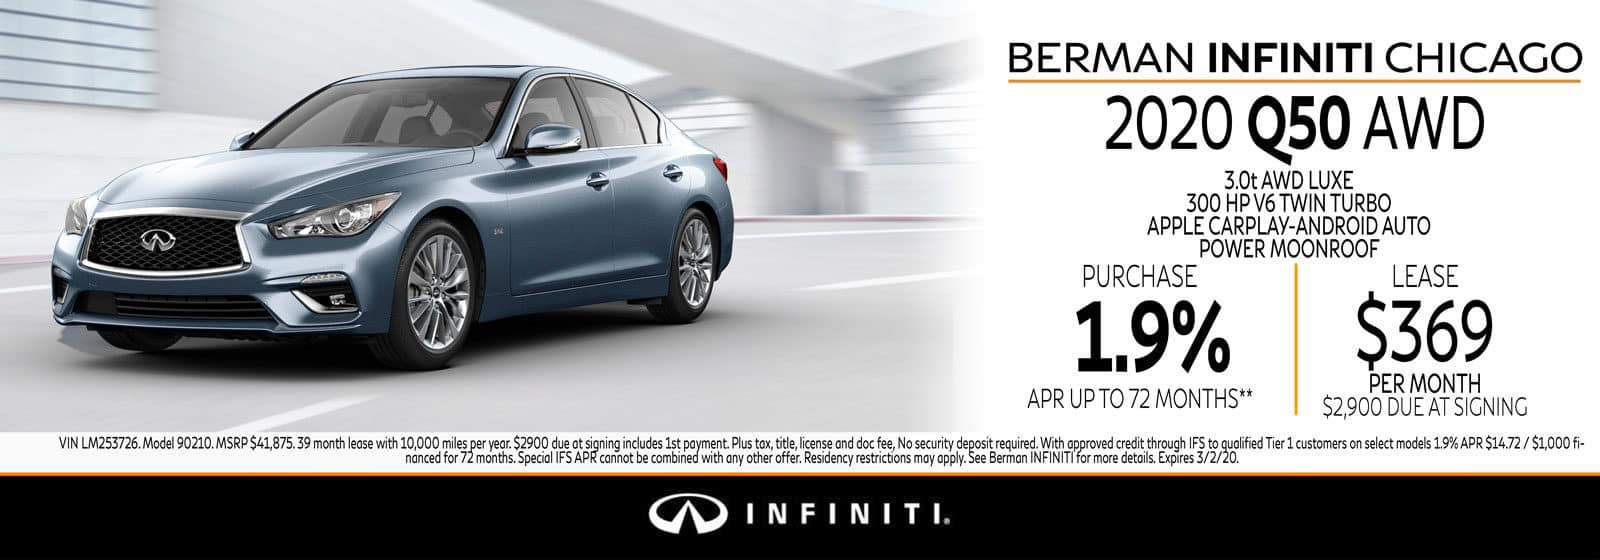 New 2020 INFINITI Q50 February offer at Berman INFINITI Chicago!